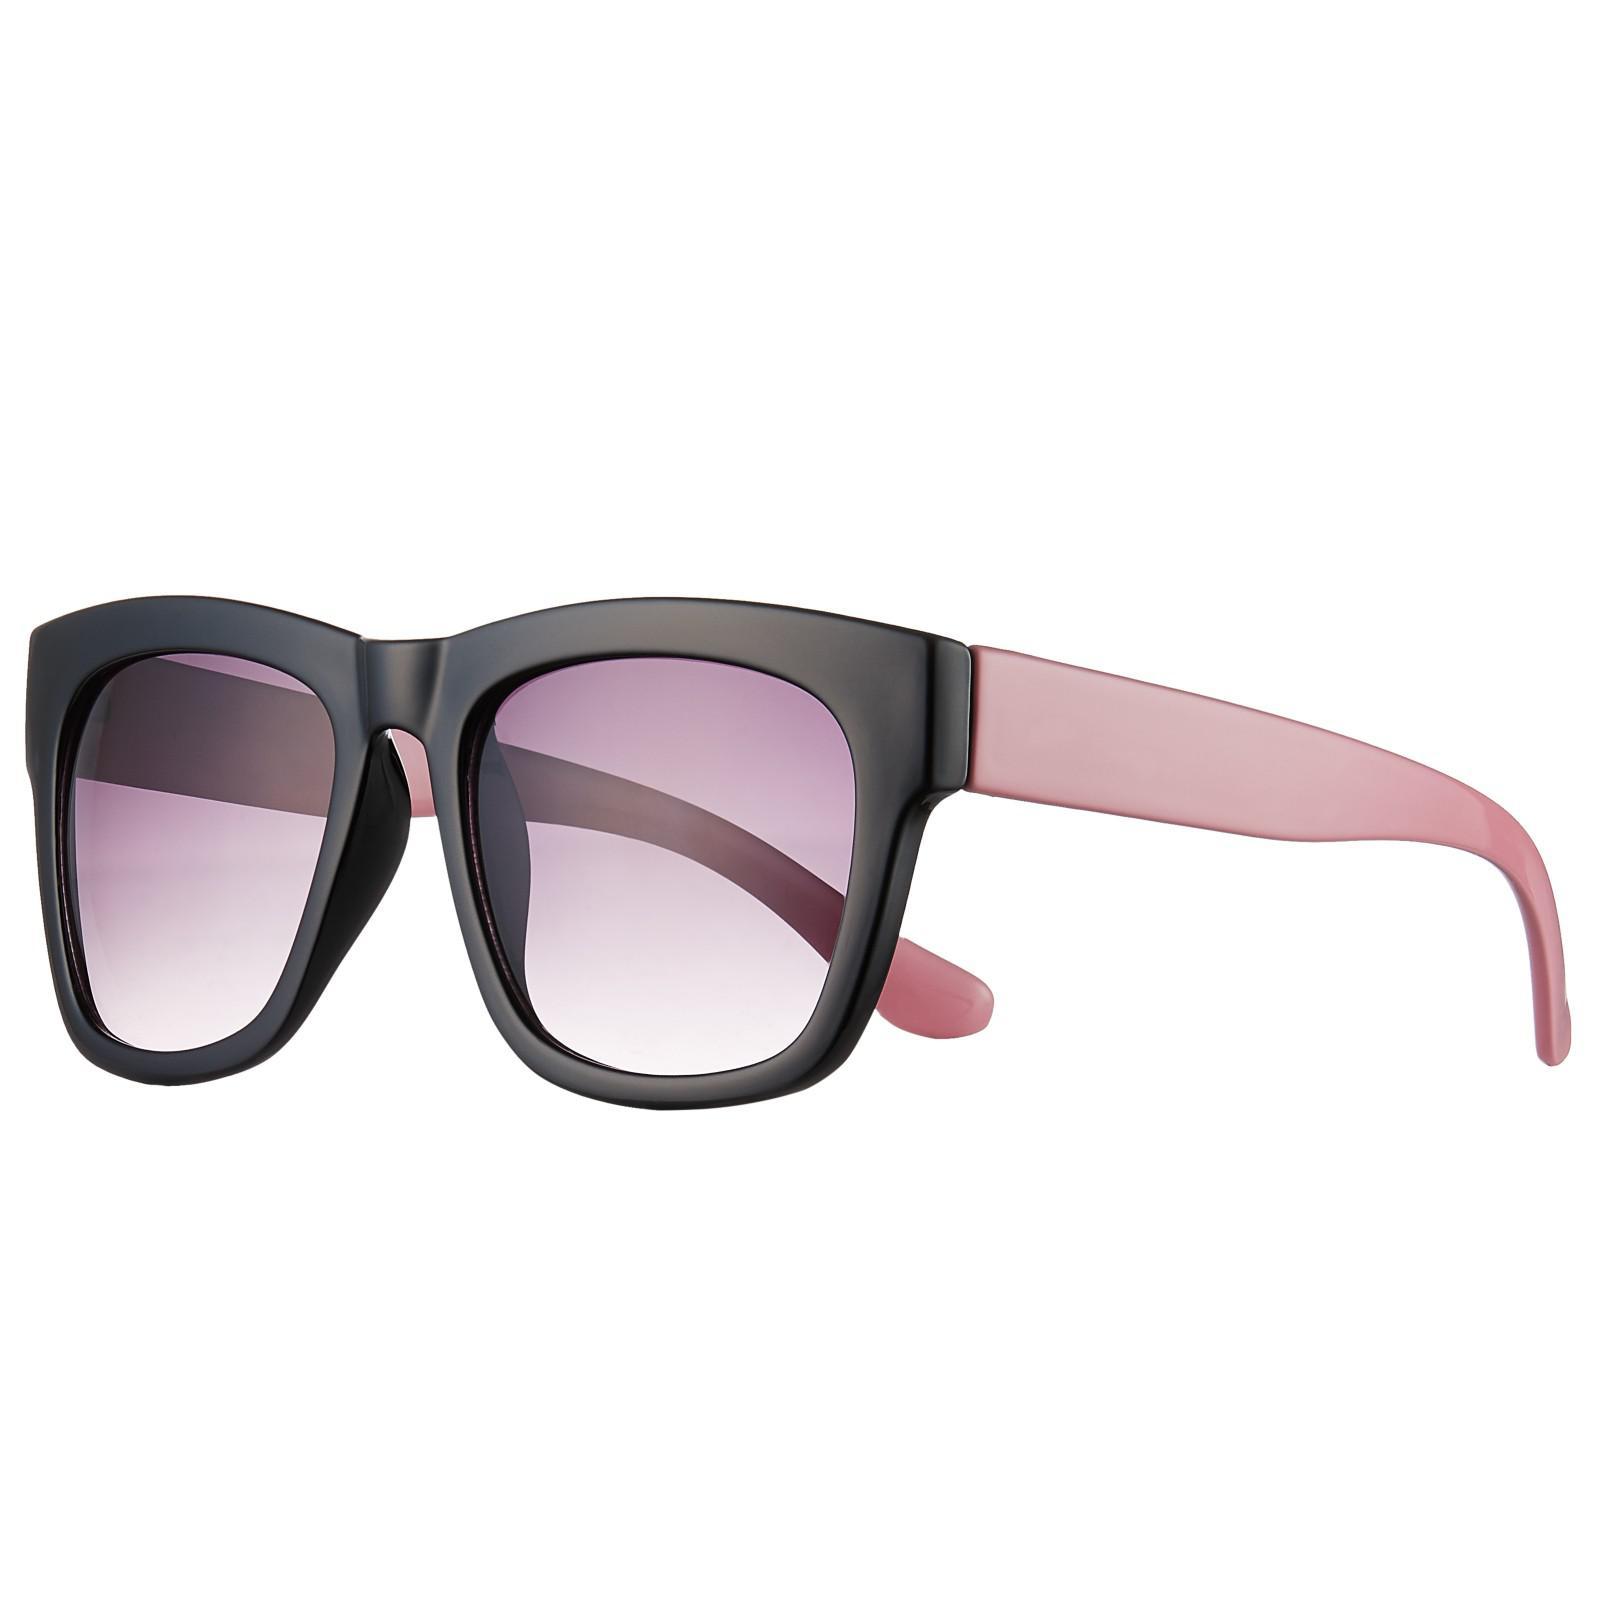 8464b05a4c John Lewis Chunky D Frame Sunglasses - Lyst